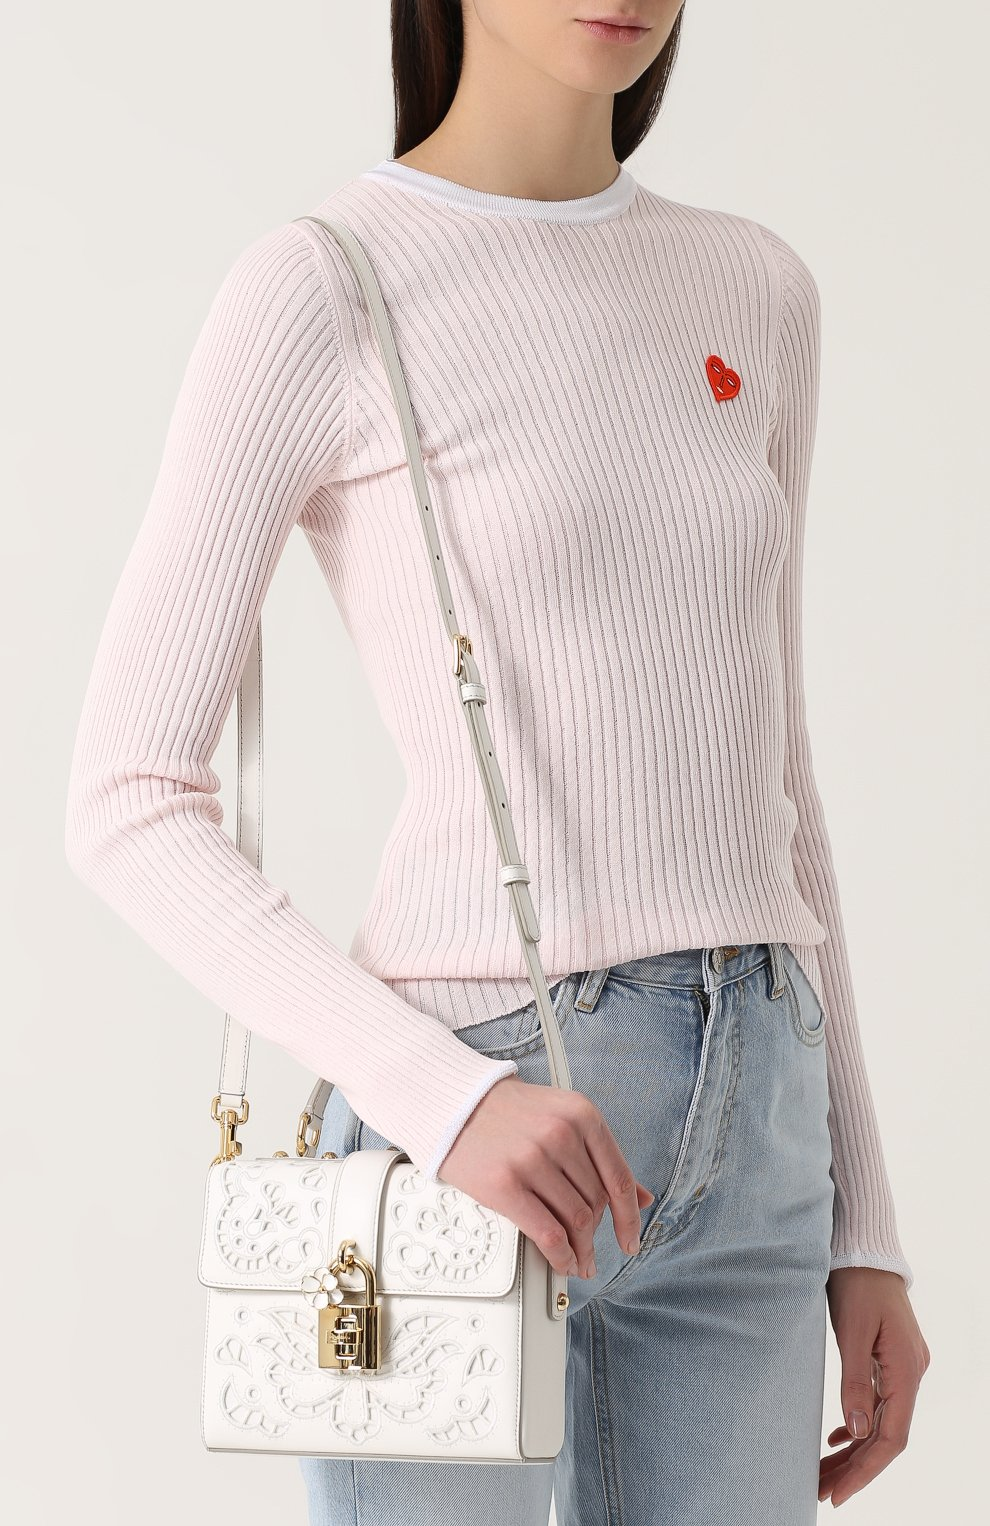 Сумка Dolce Soft с перфорацией Dolce & Gabbana белая цвета | Фото №5